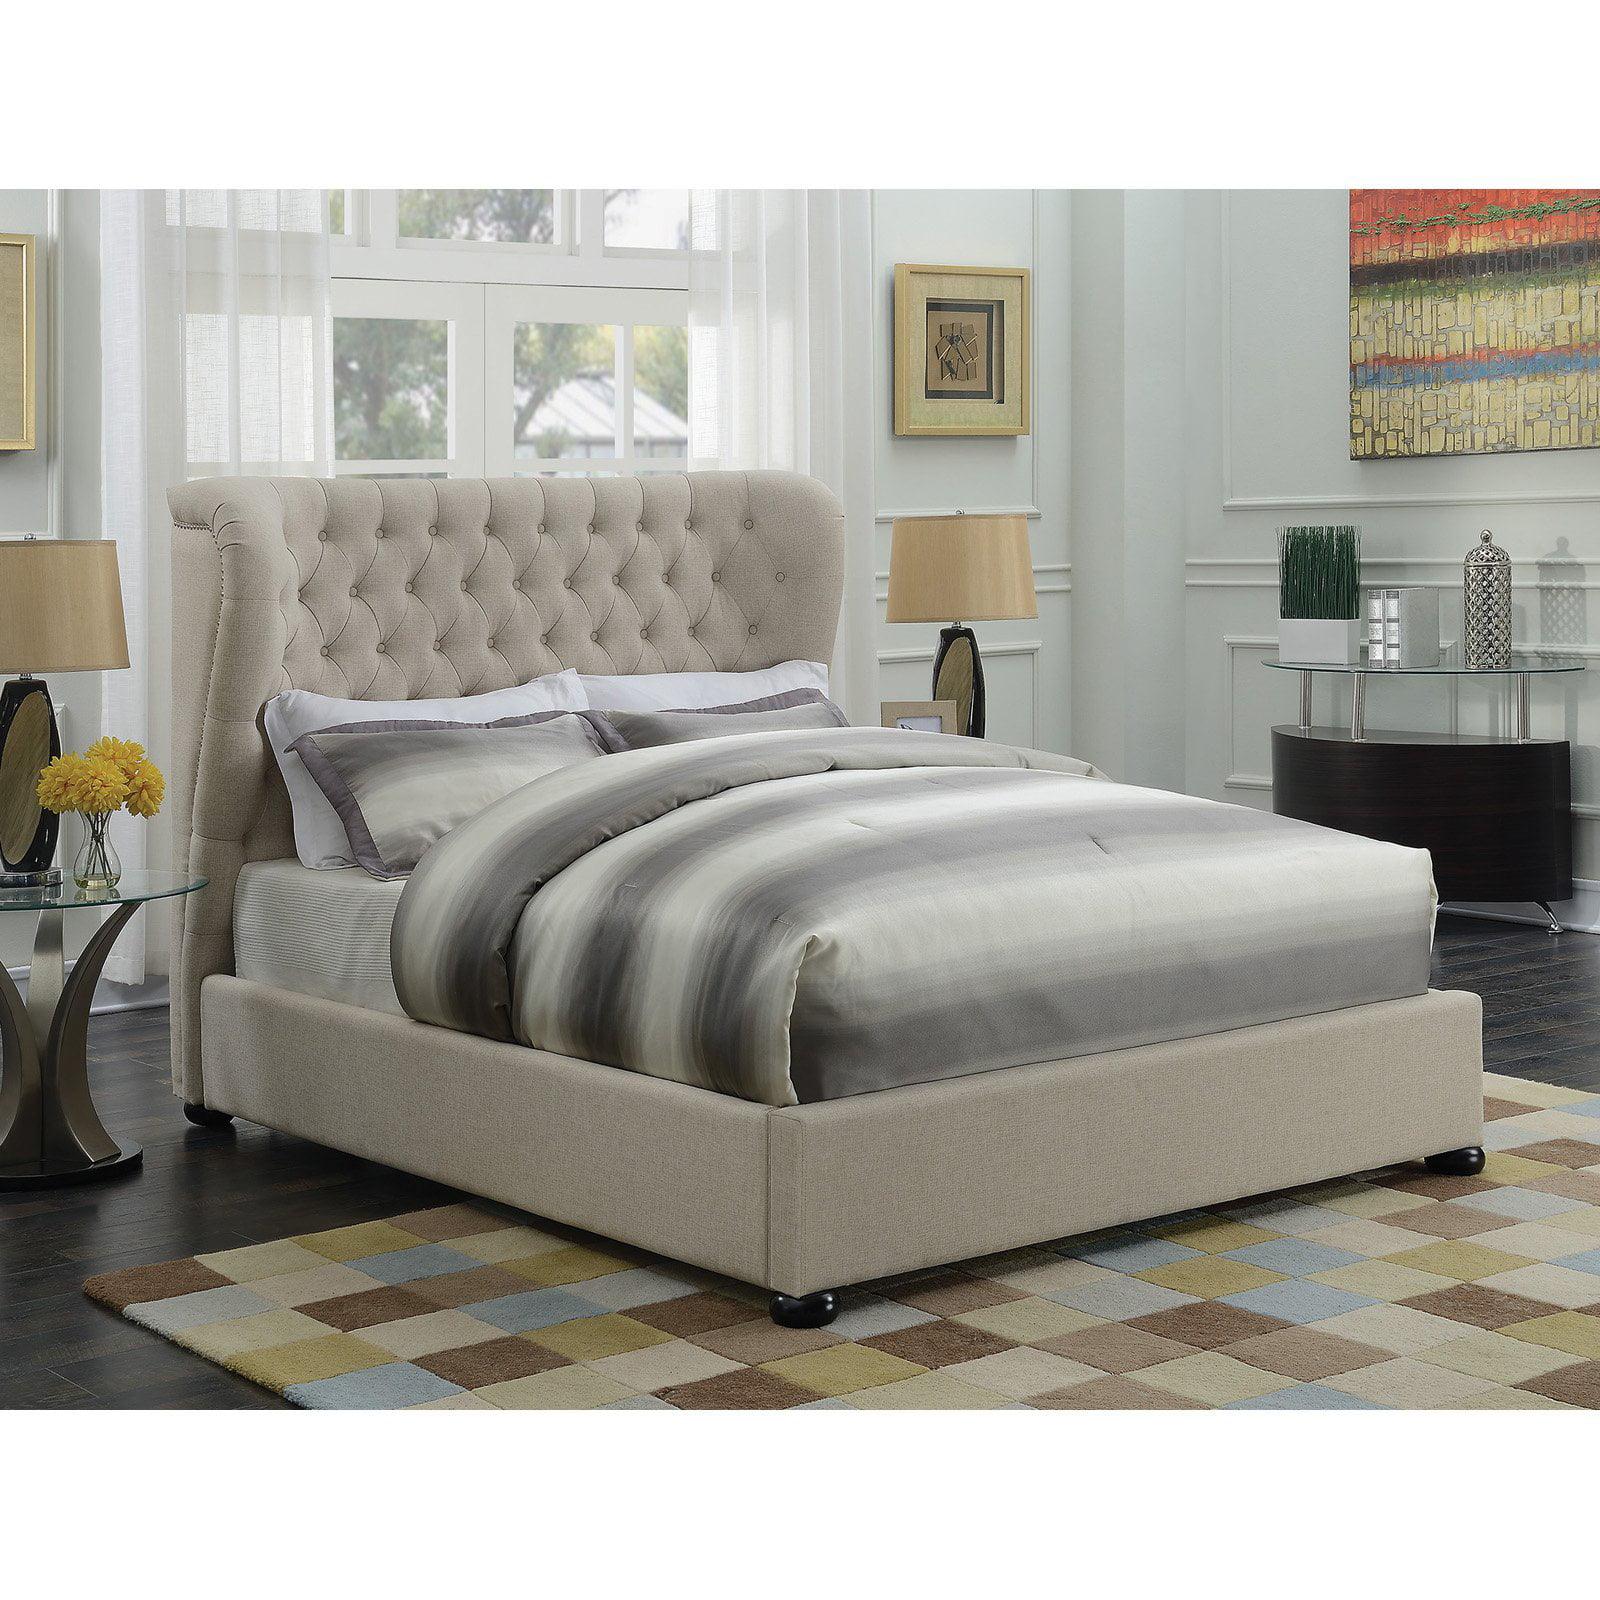 Coaster Furniture Newburgh Wingback Upholstered Panel Bed